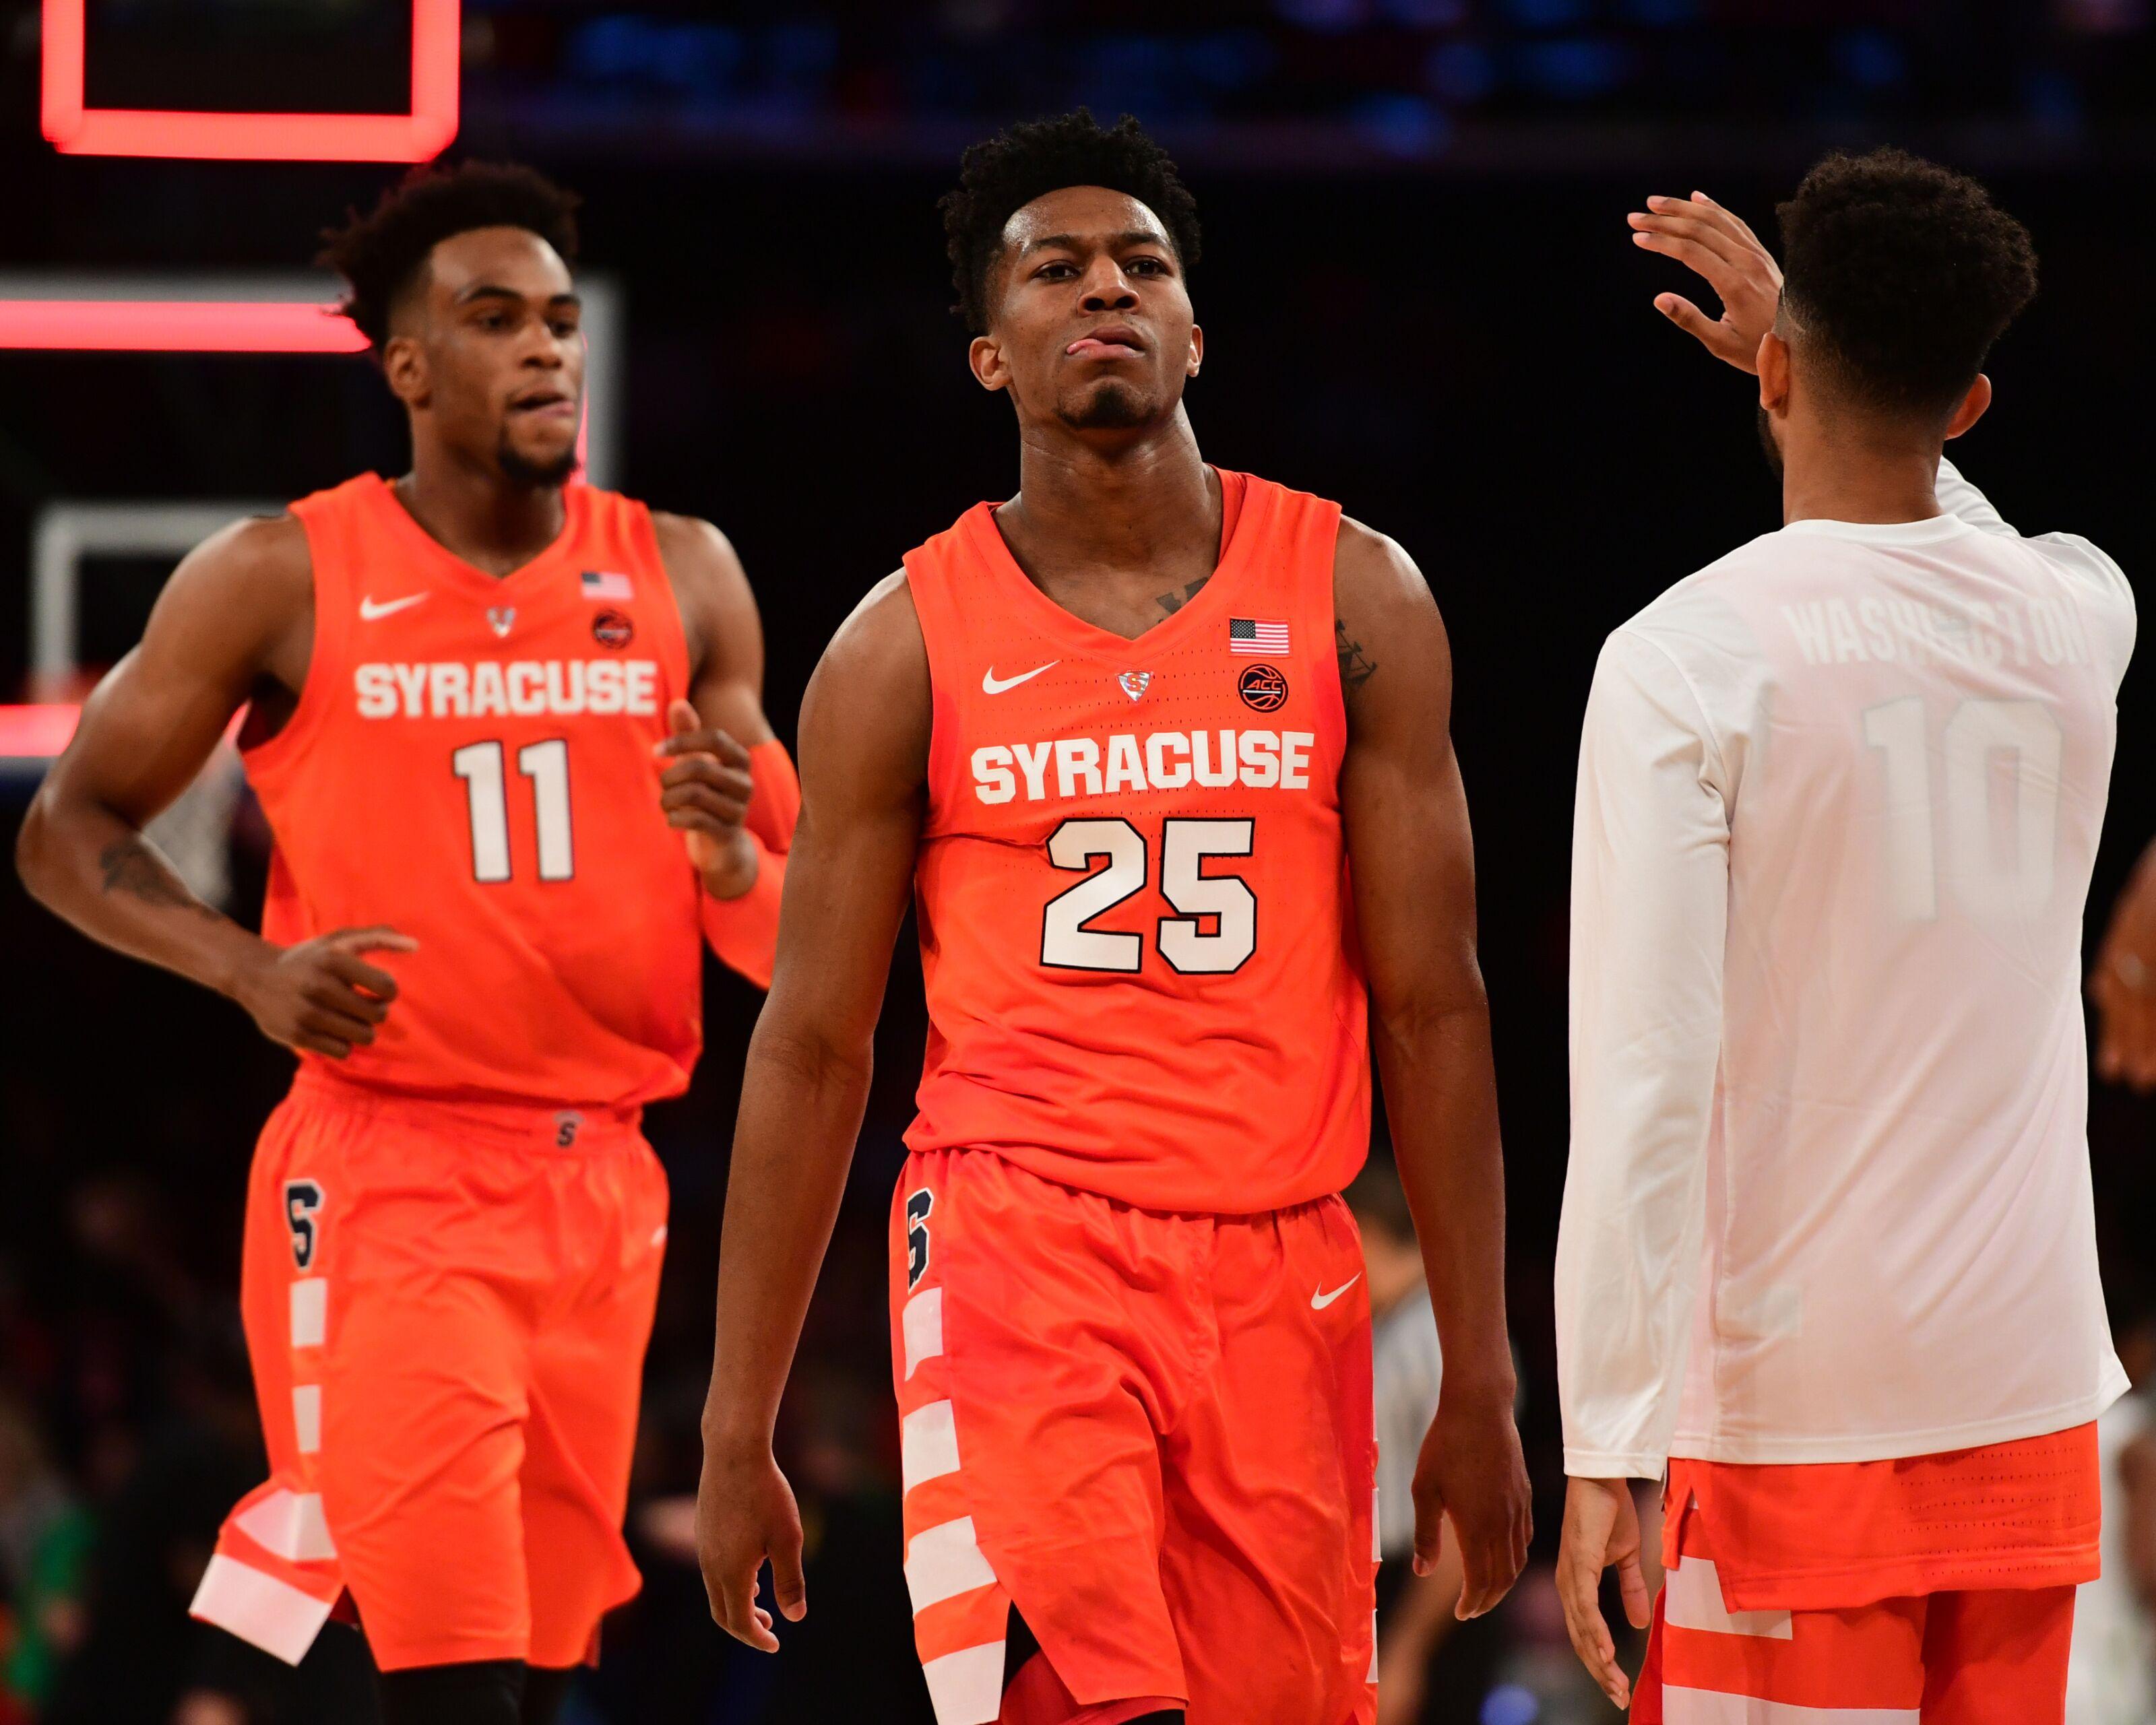 another chance b454a 29dd3 Syracuse Basketball: Tyus Battle, Oshae Brissett NBA Draft ...